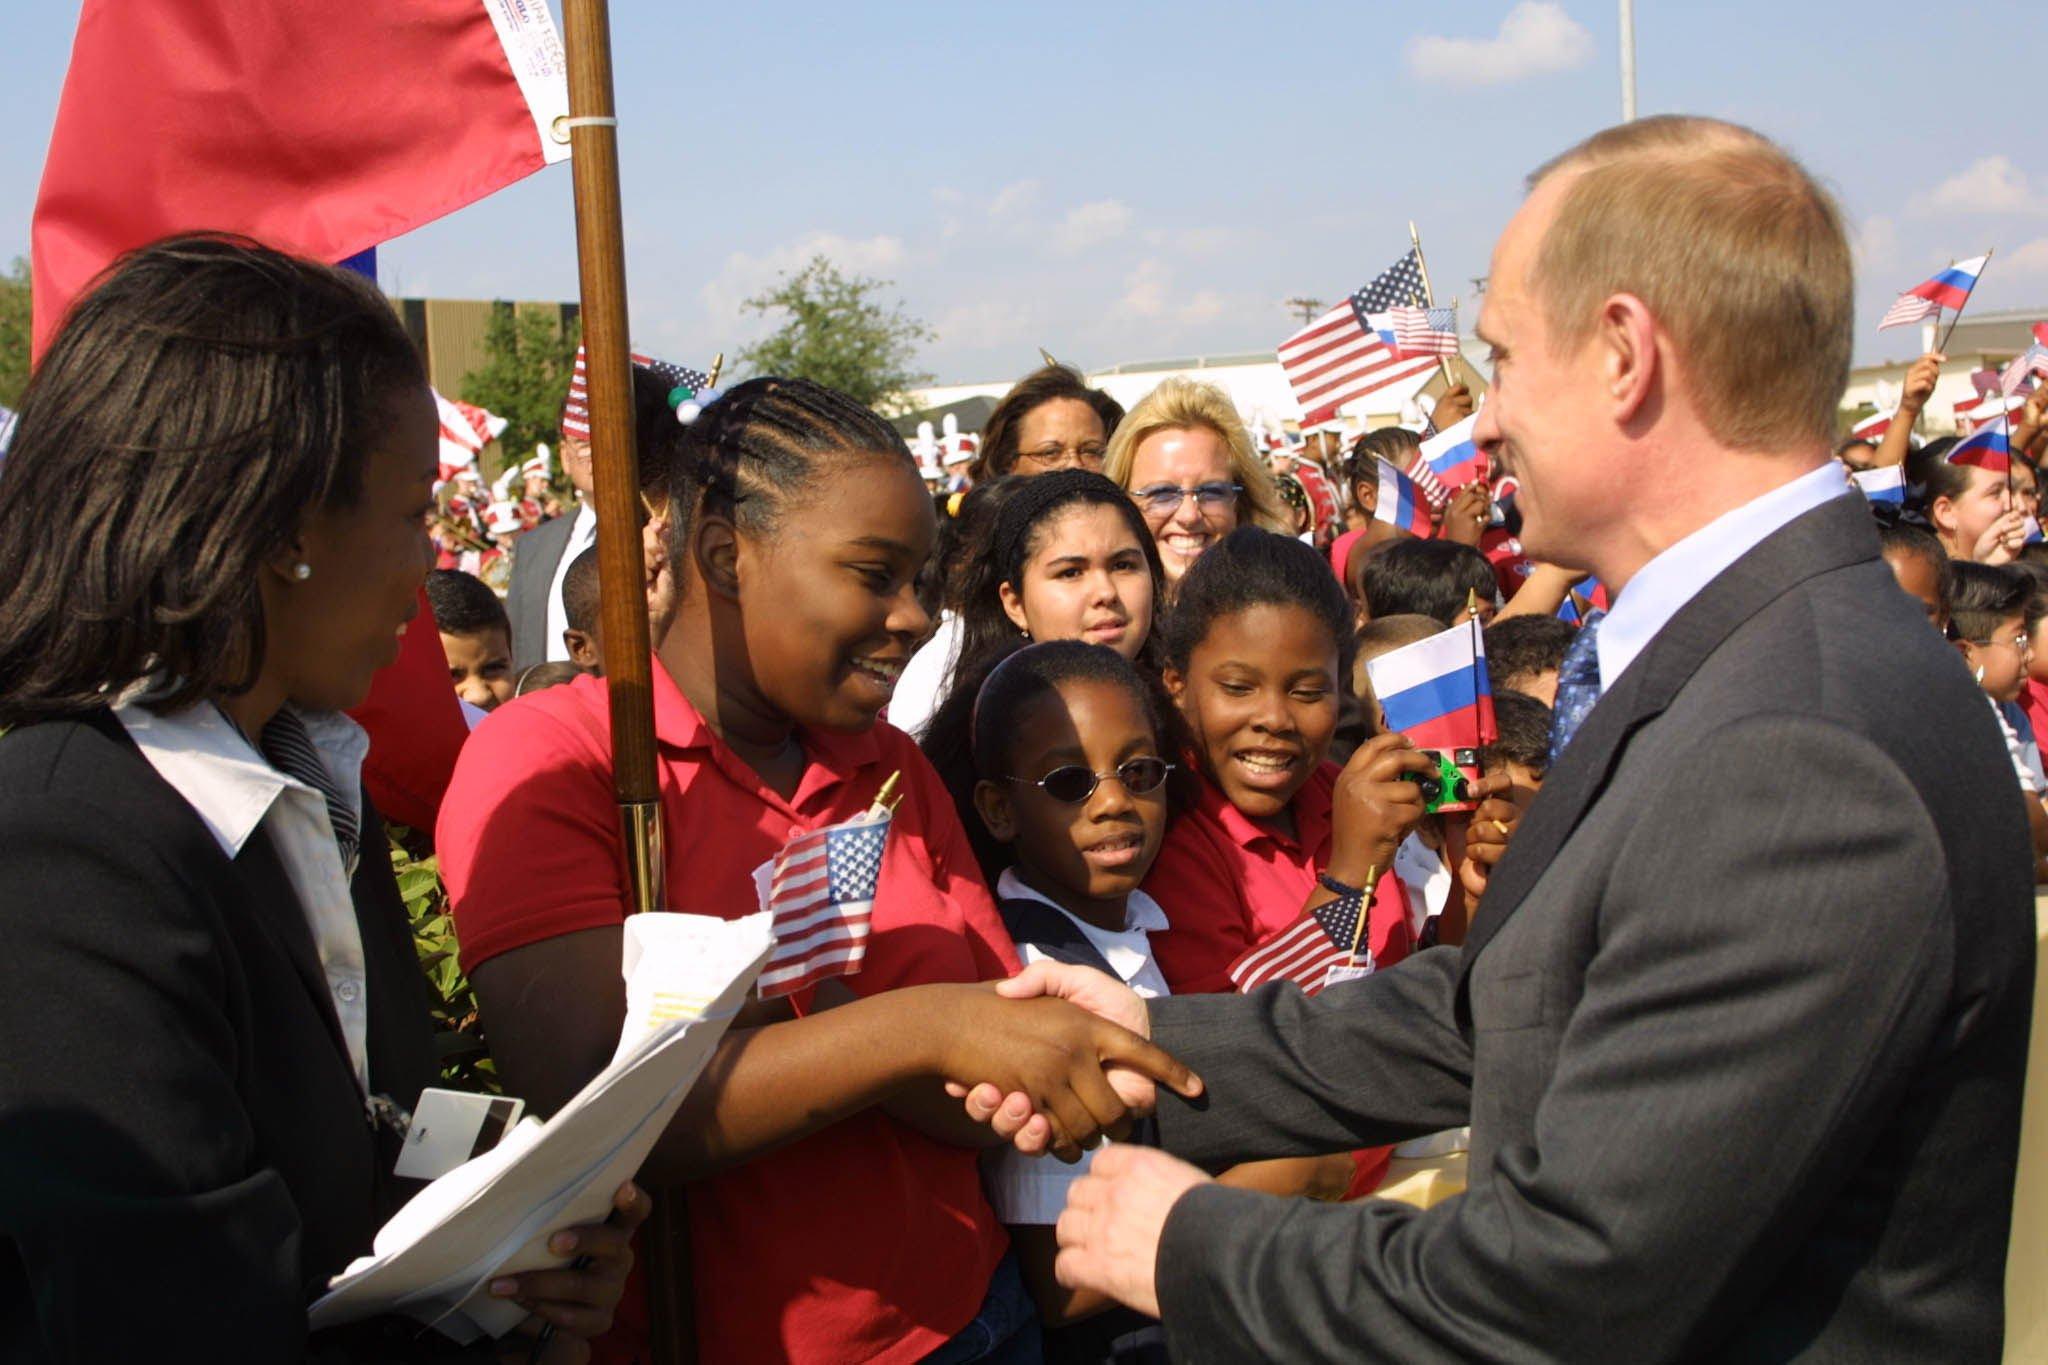 Vladimir Putin in the United States 13-16 November 2001-22.jpg